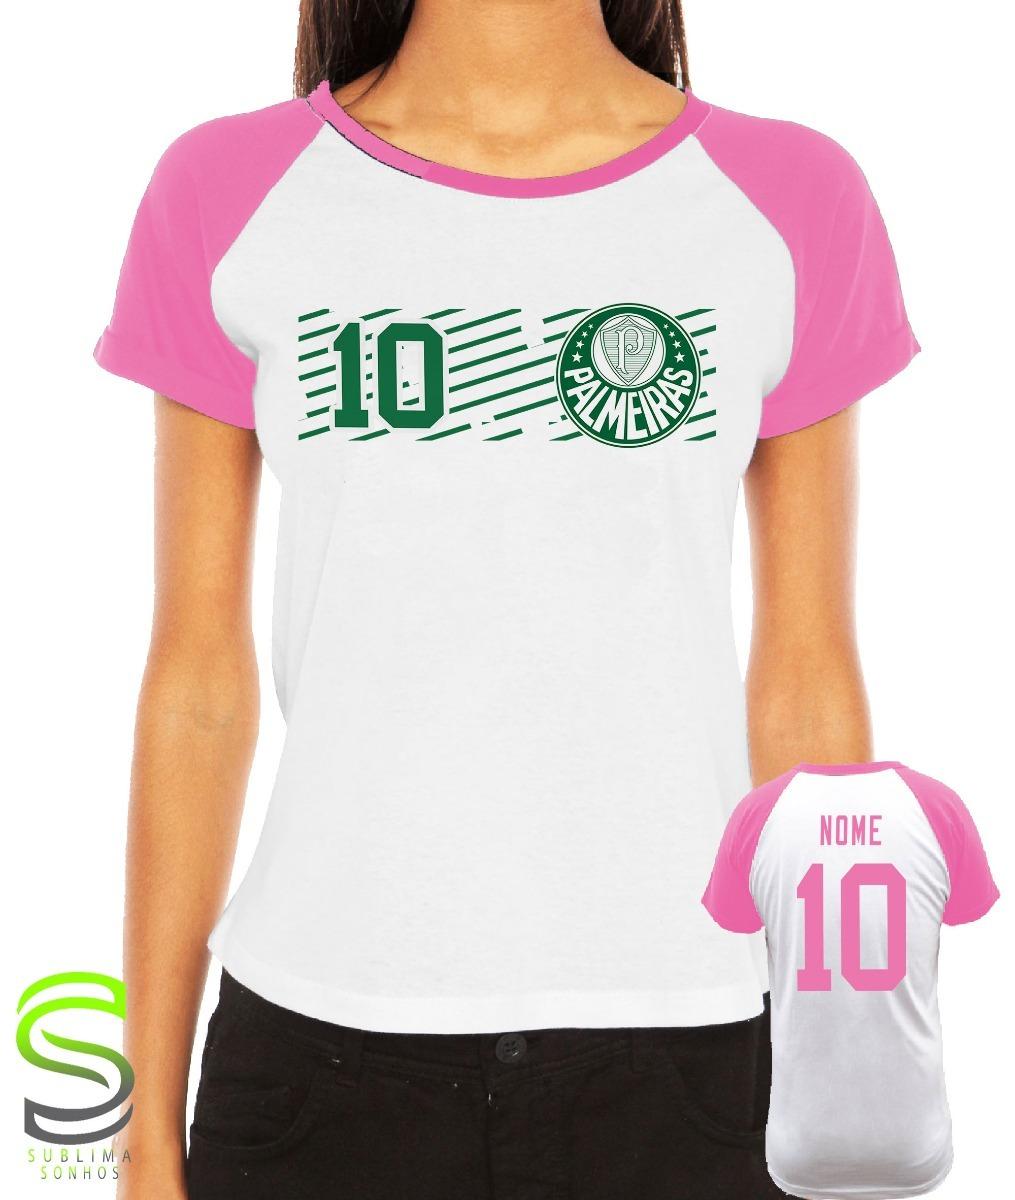 camiseta palmeiras feminia personalizada. Carregando zoom. 71251f2d97ea4